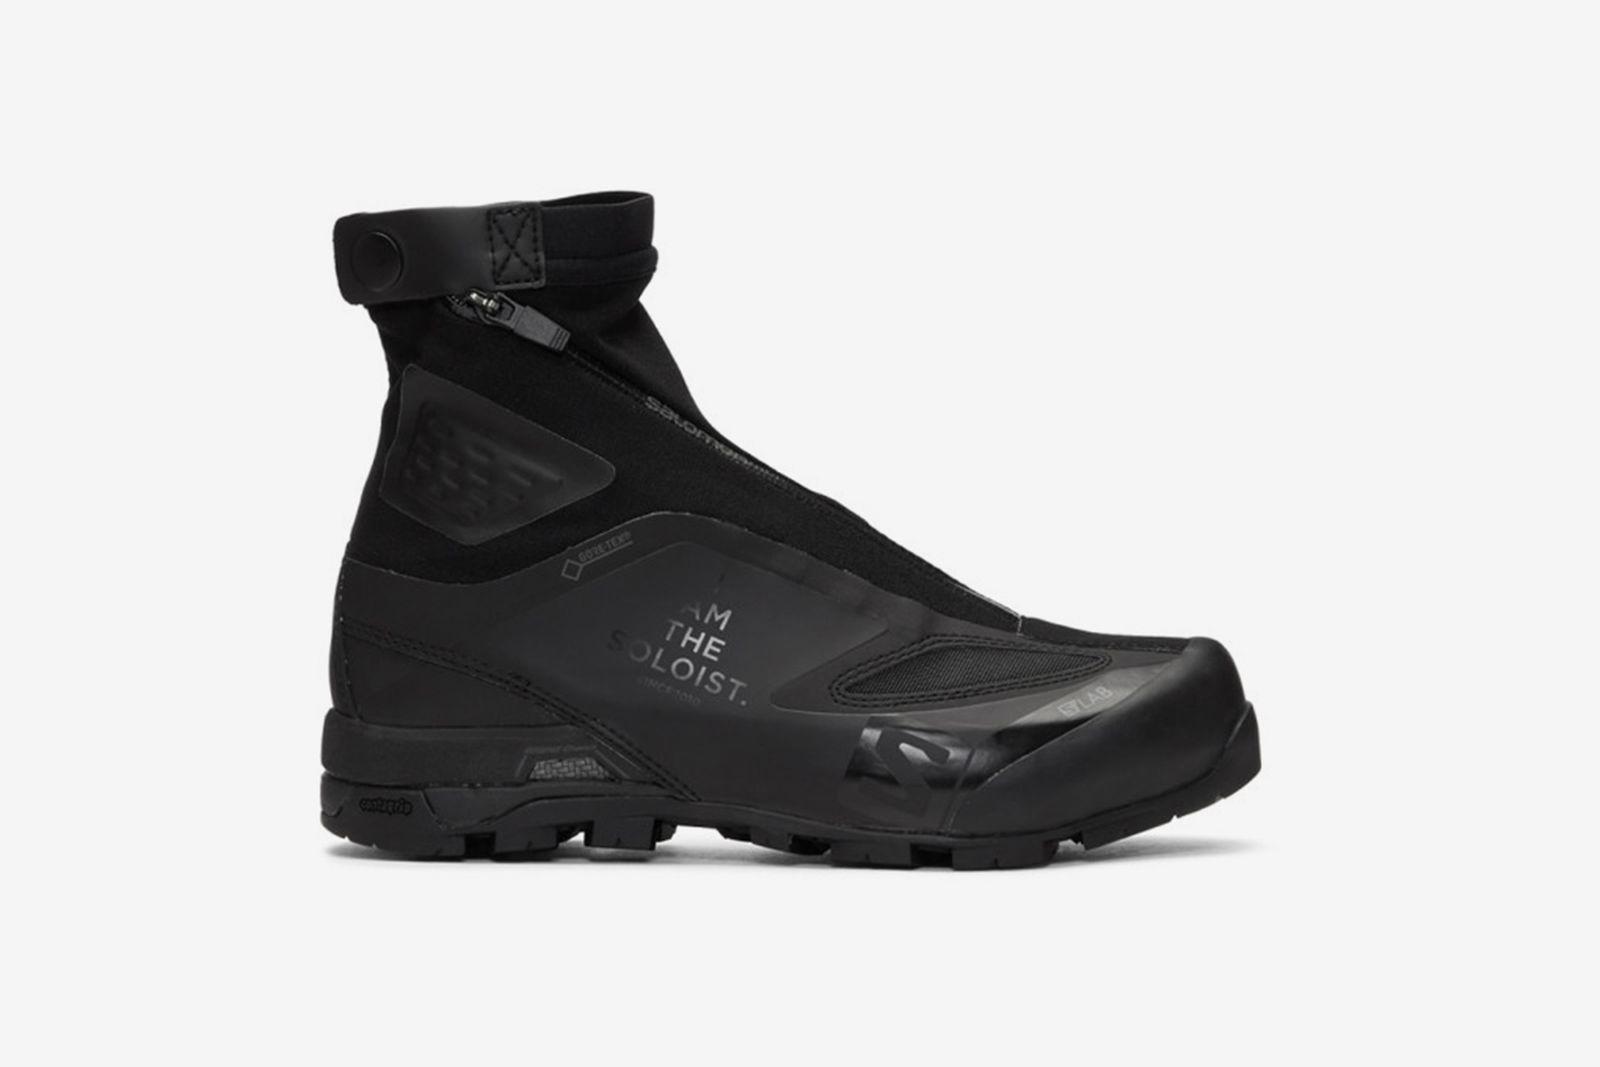 salomon-best-sneakers-02